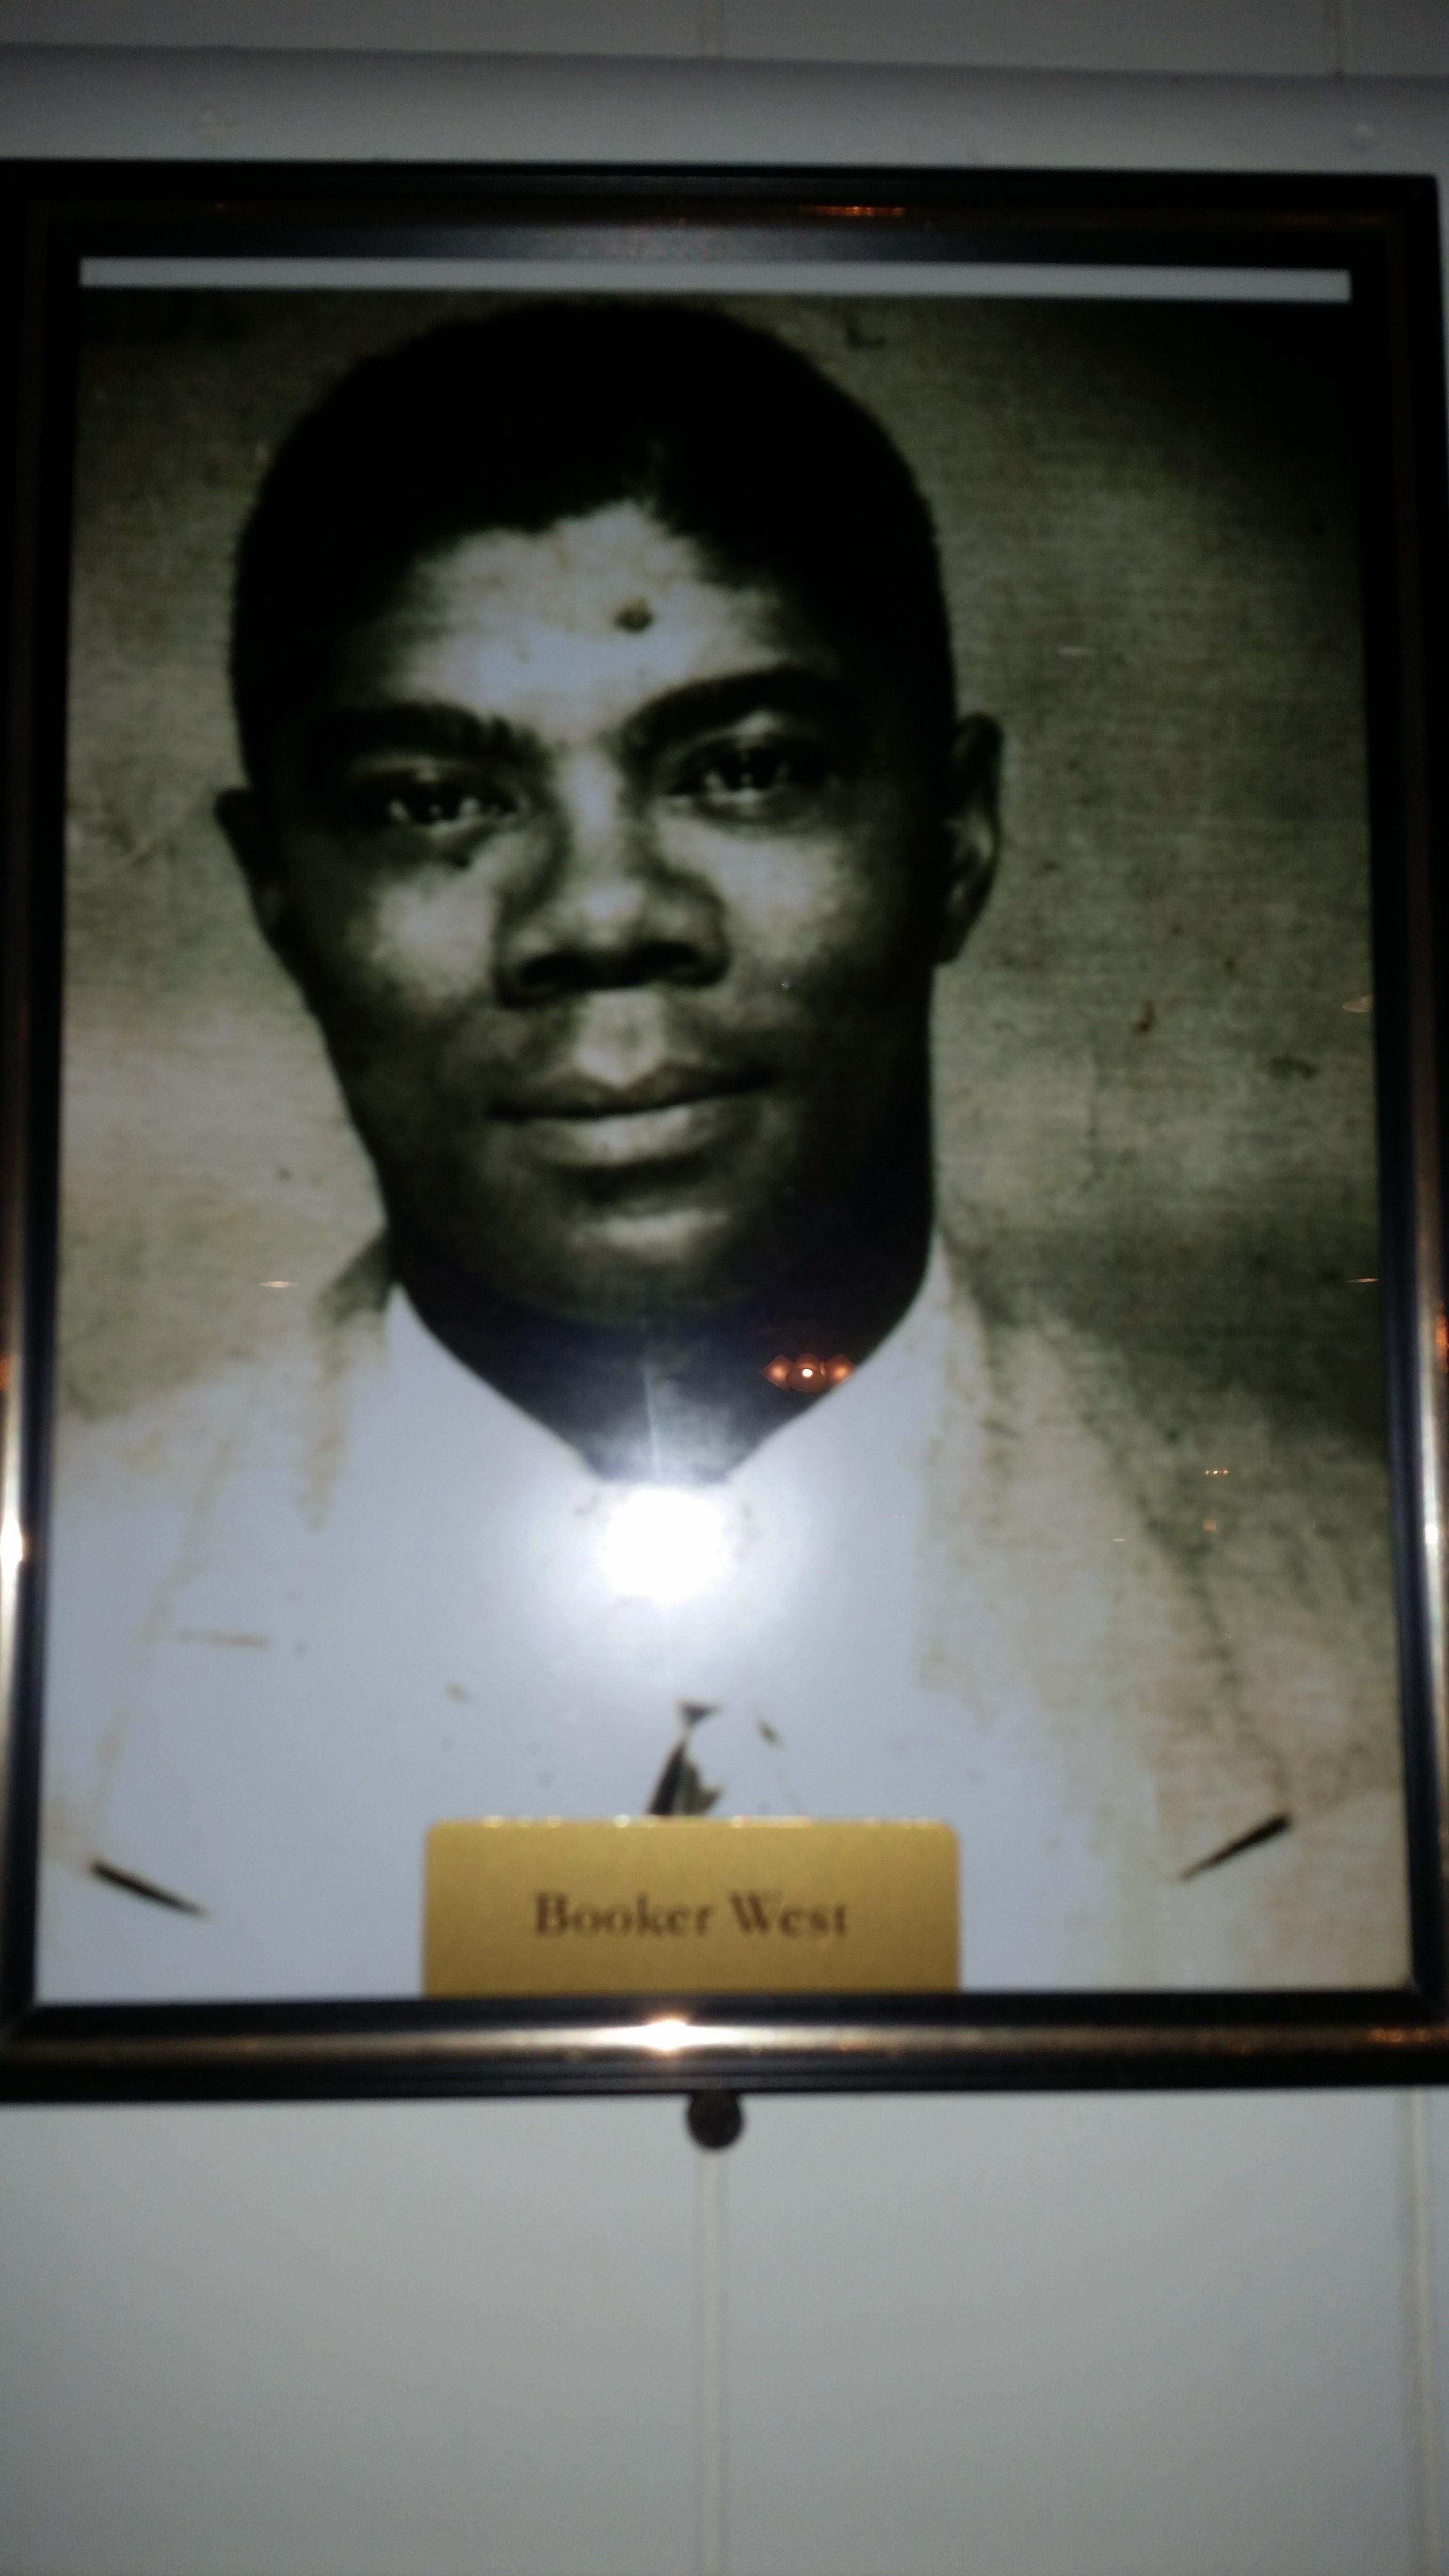 Mr. Booker West